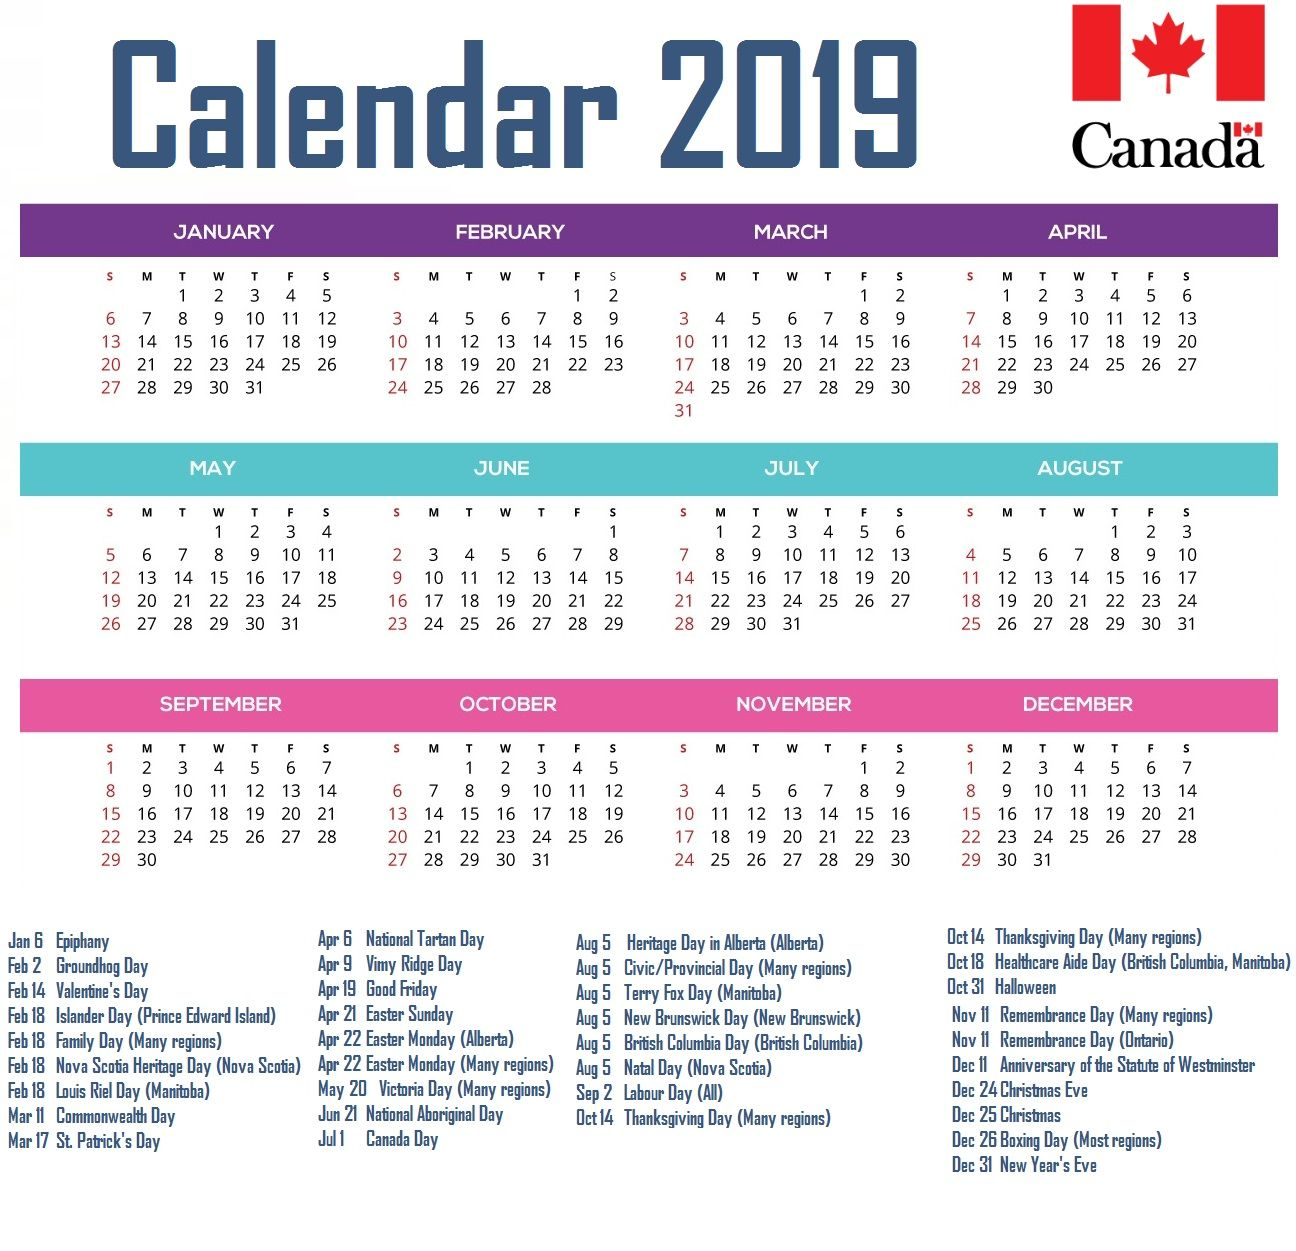 April 2019 Calendar Canada With Bank Public Federal Holidays Holiday Calendar Printable Holiday Calendar Calendar Template